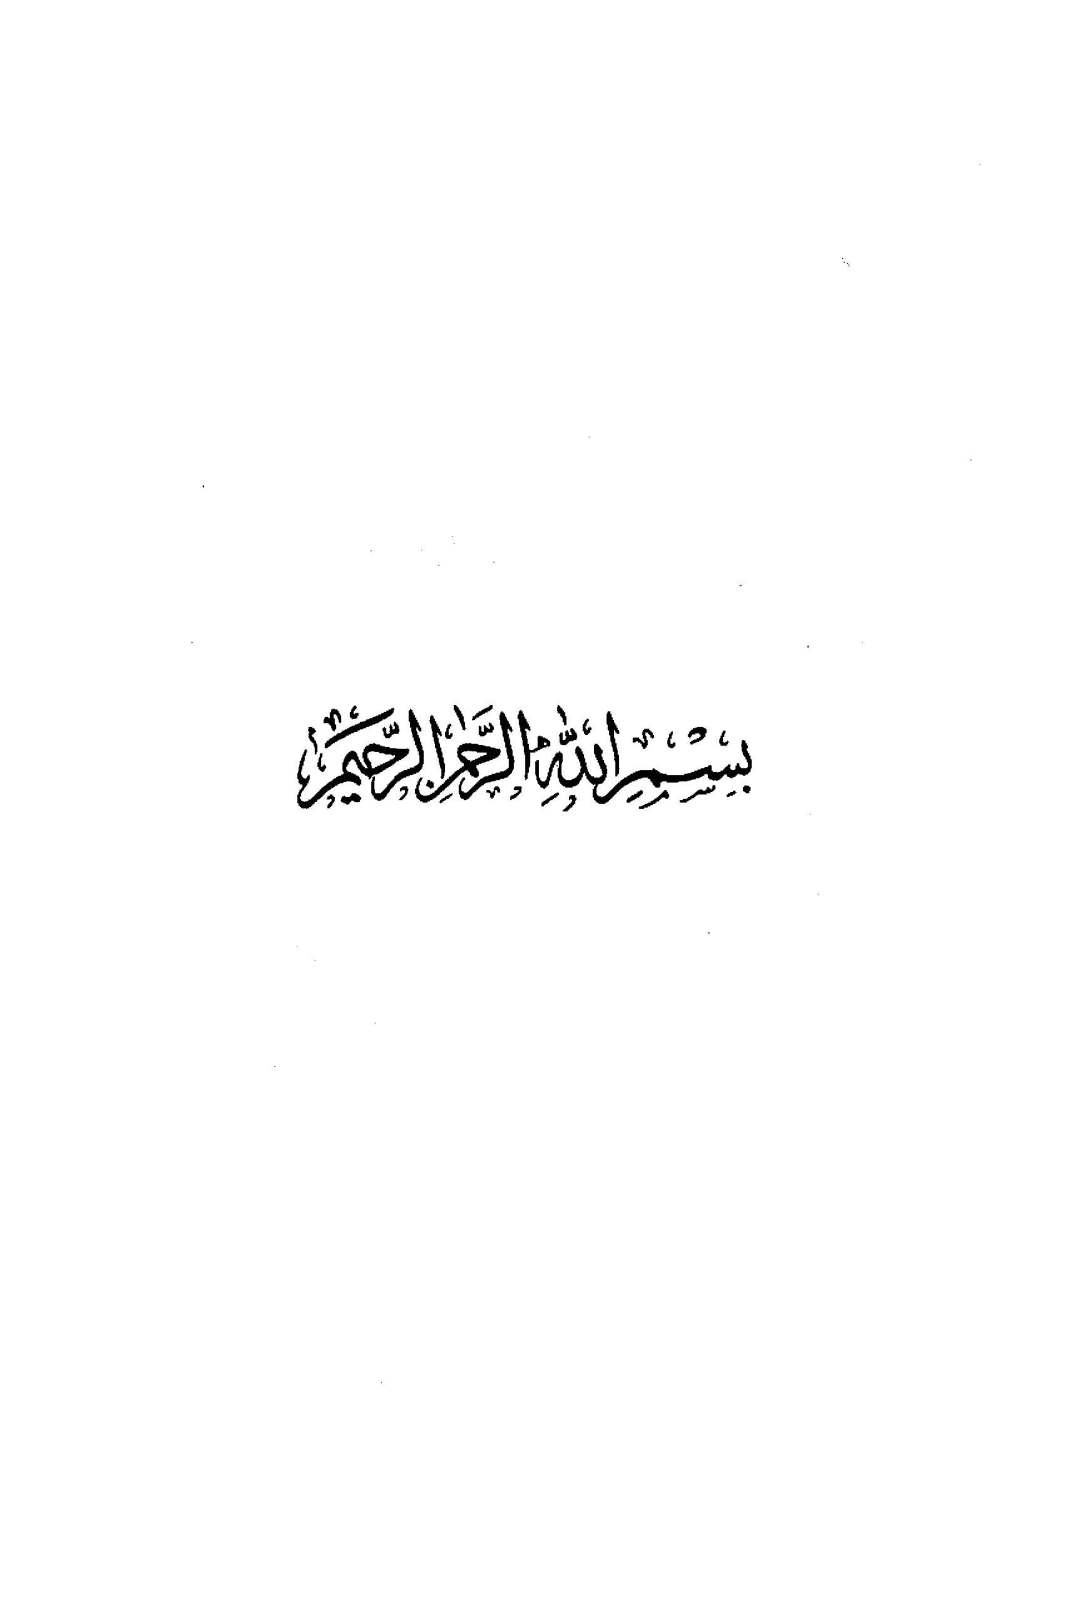 MuhammadpeaceBeUponHimInTheTorahAndGospel_Page_05